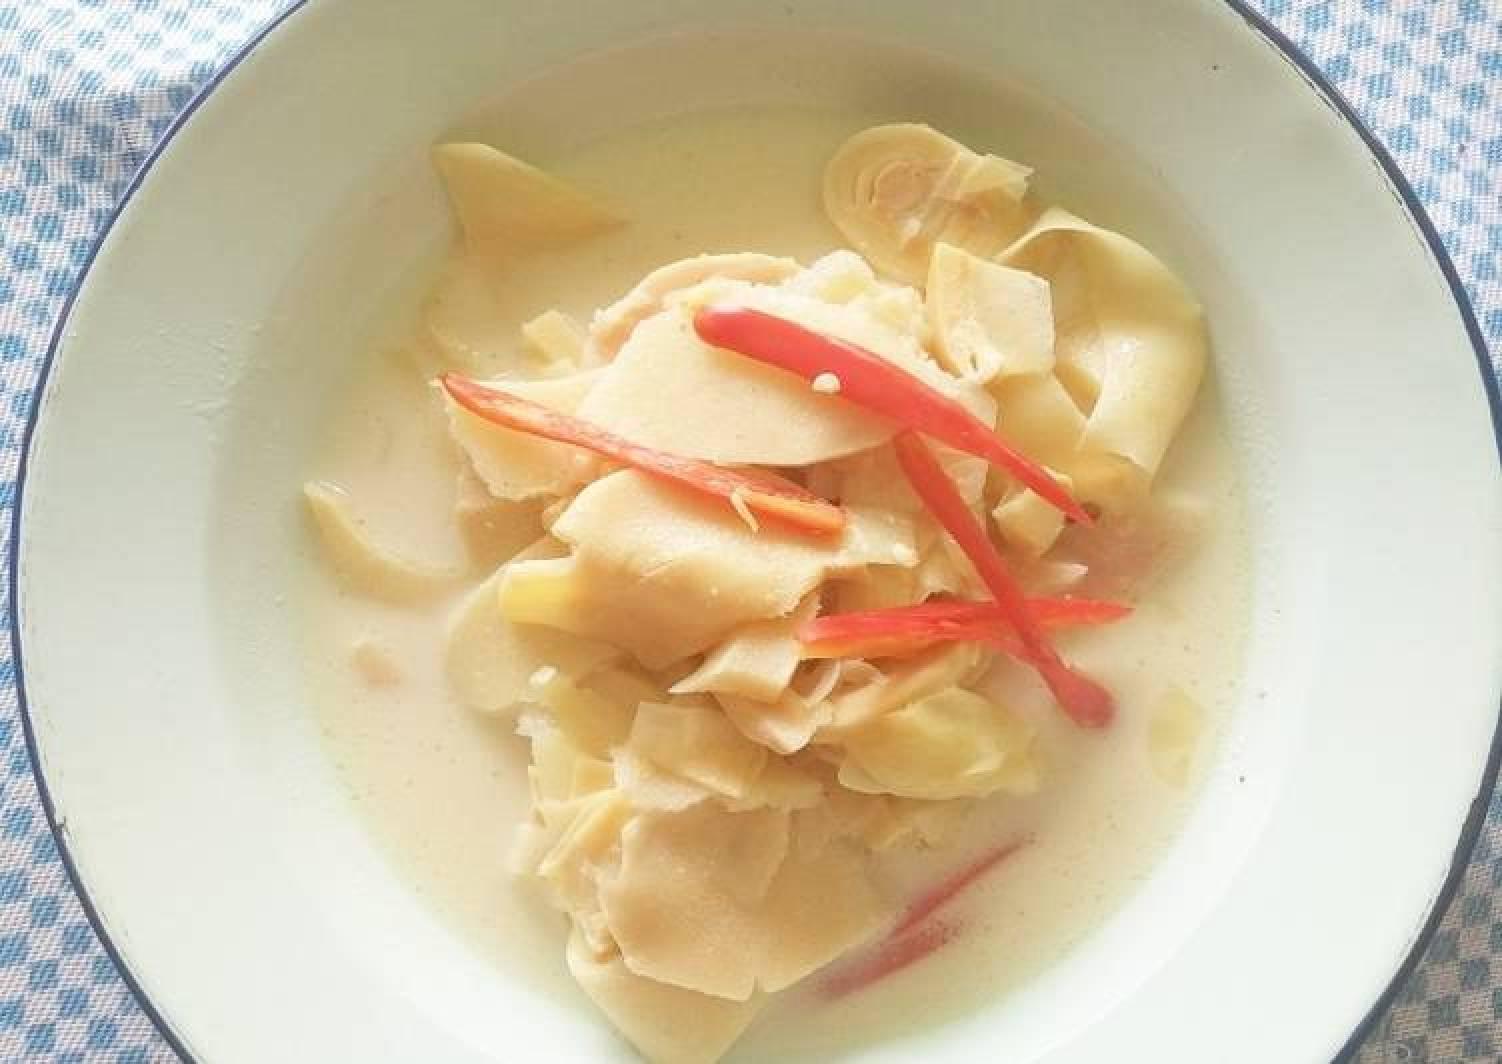 Rebung Kuah Curry Putih (Bamboo Shoot with White Curry)